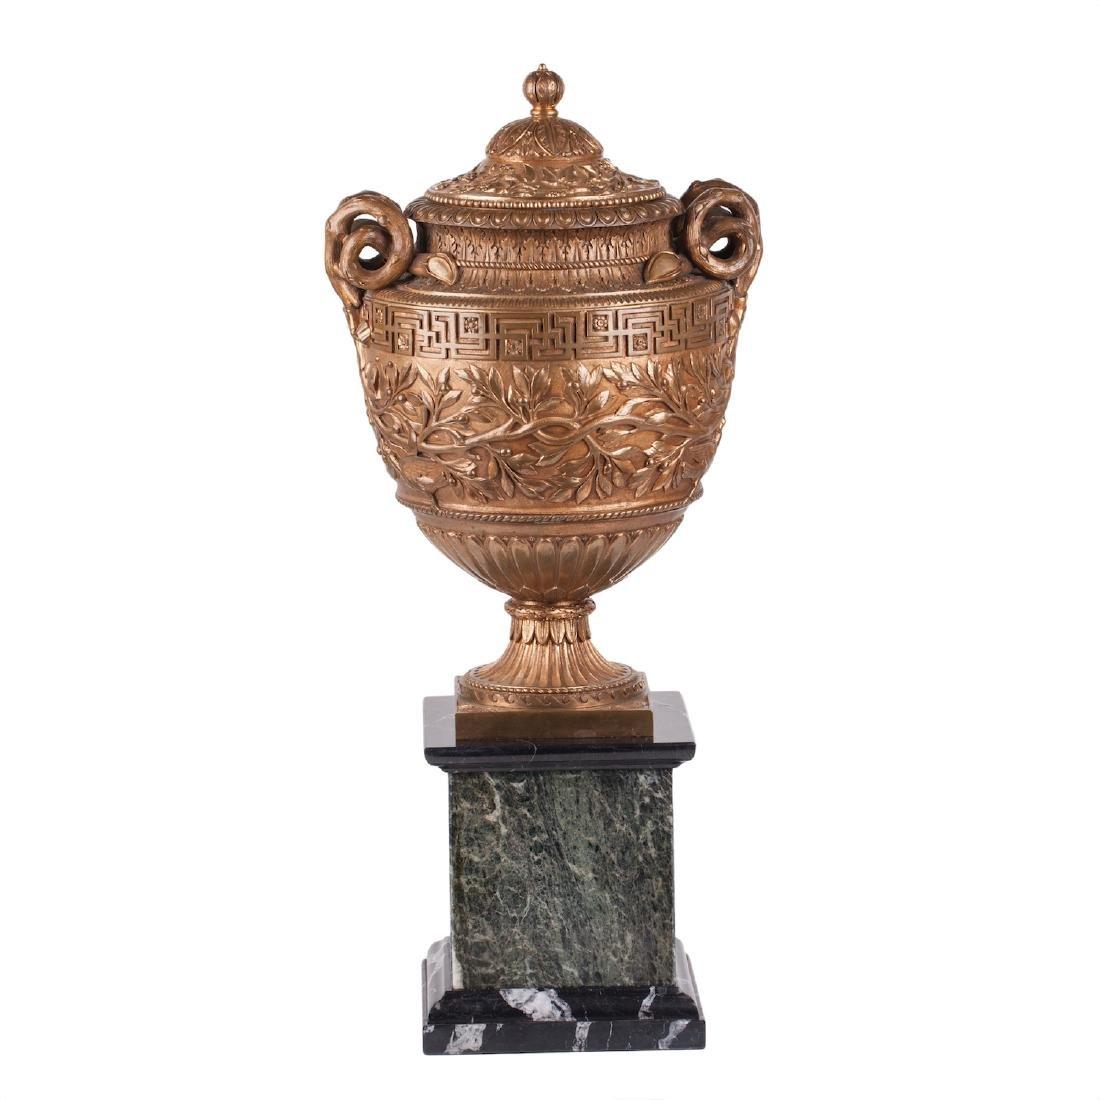 Impressive Italian bronze vase by B. Bochetti